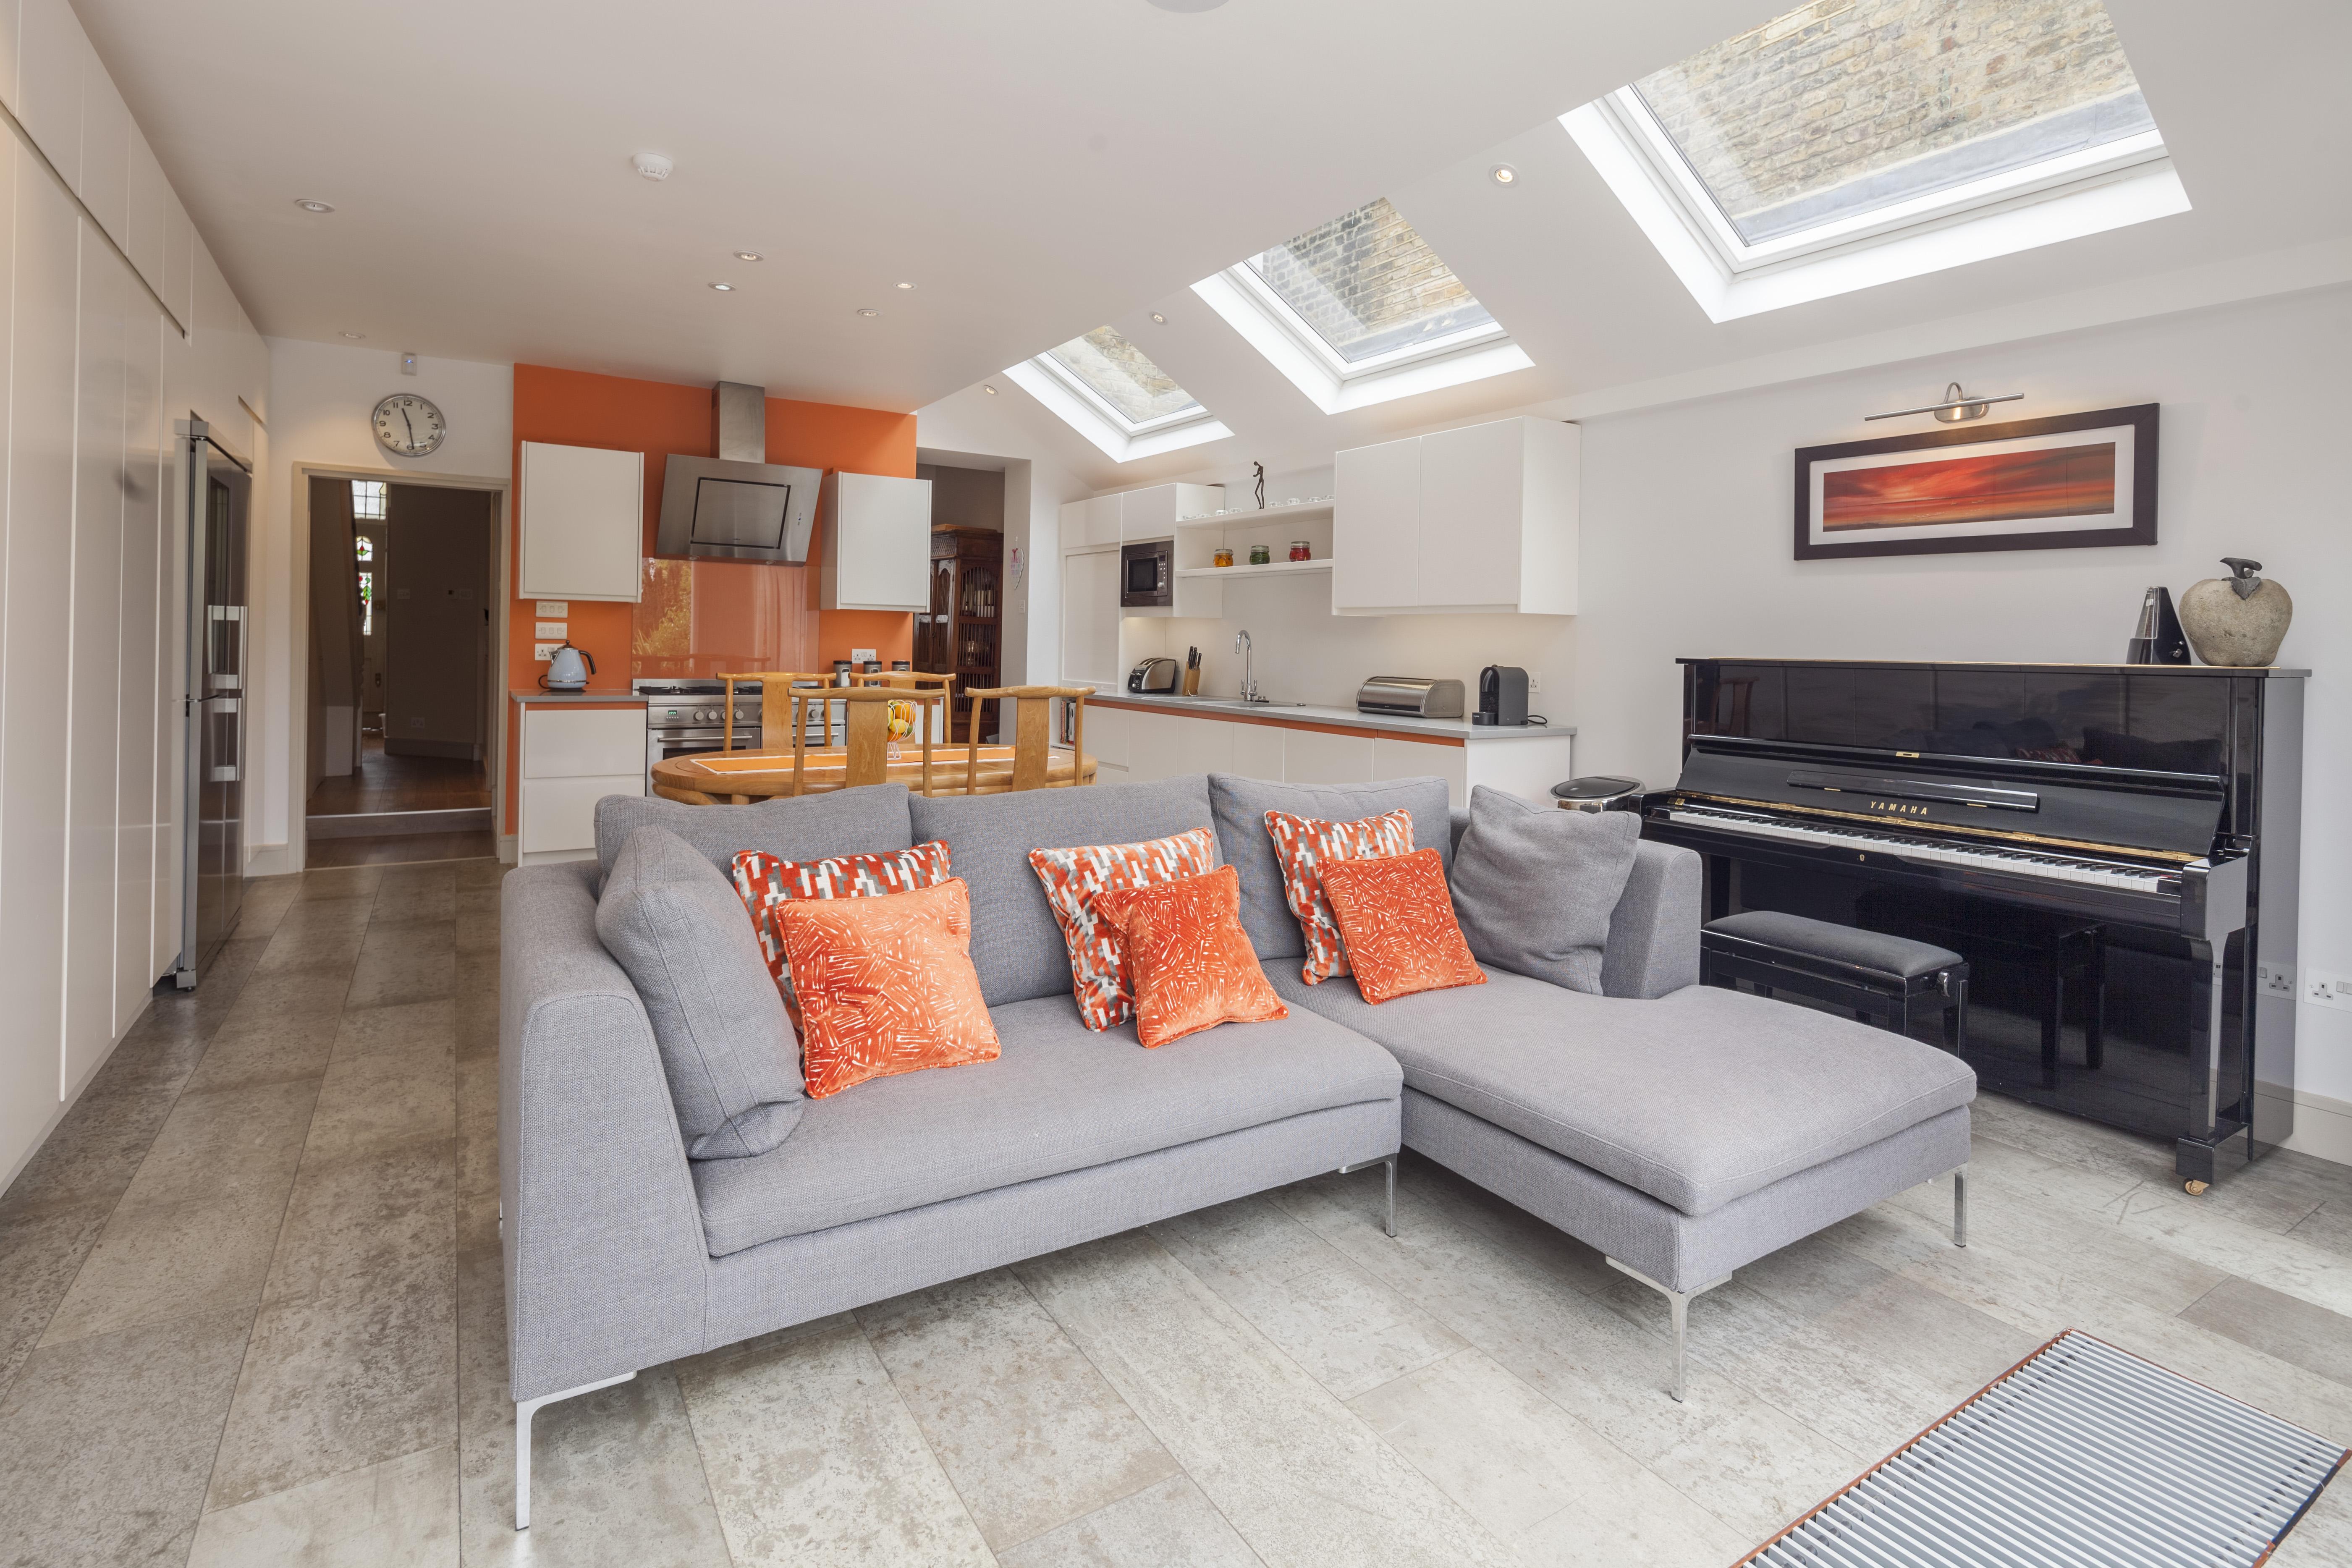 rjv-home-design-refurbishment-london-607e367910b99